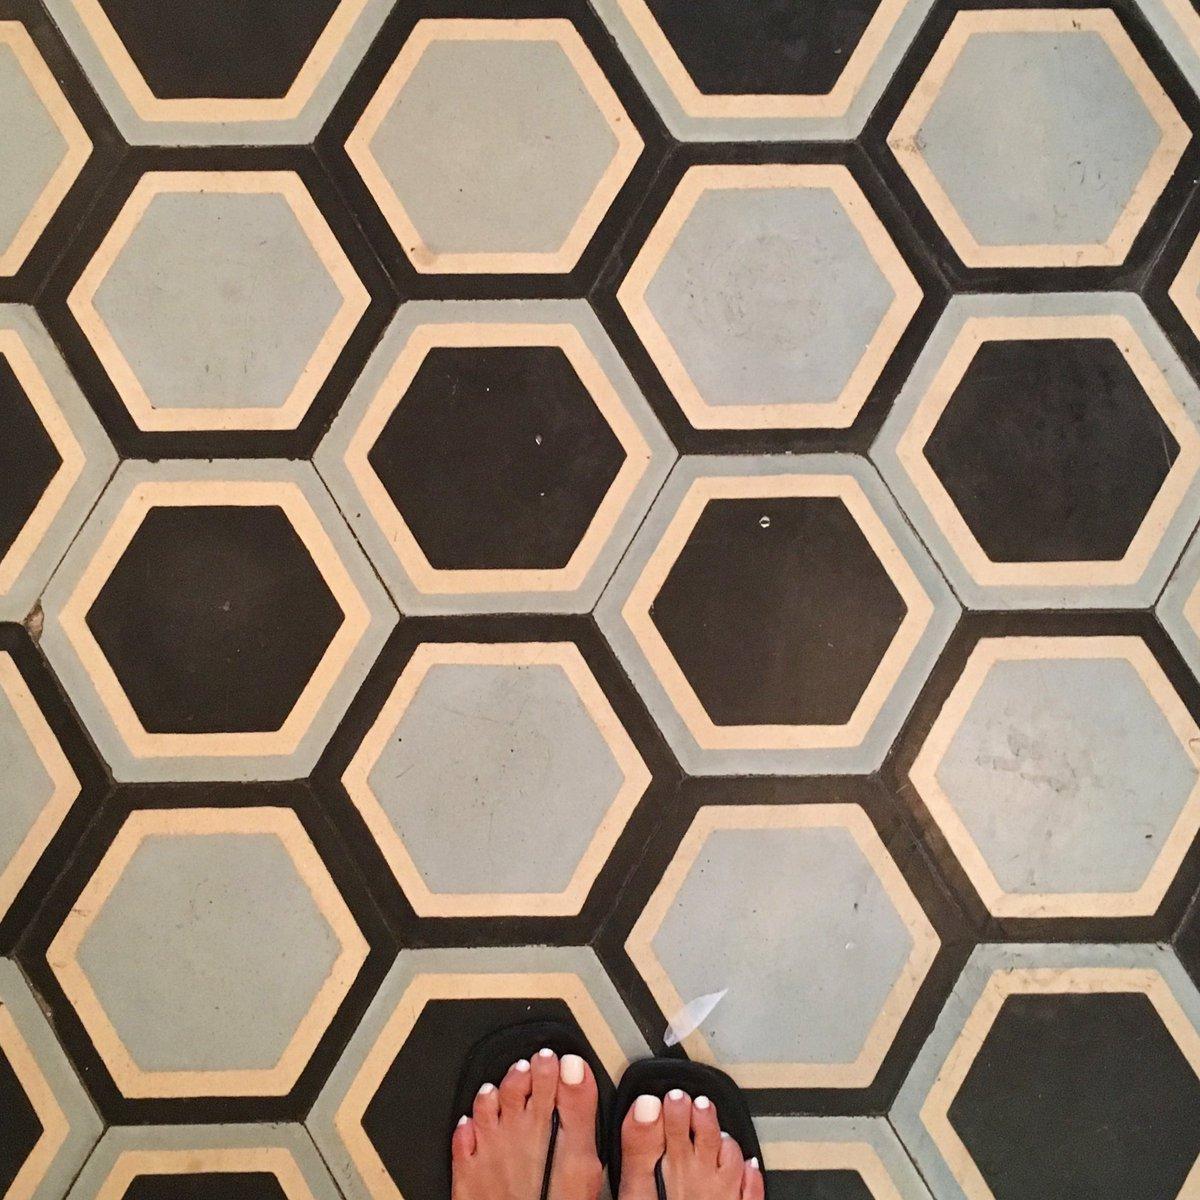 Caseyinteriordesign On Twitter Classic Hexagonal Floor Tile Found